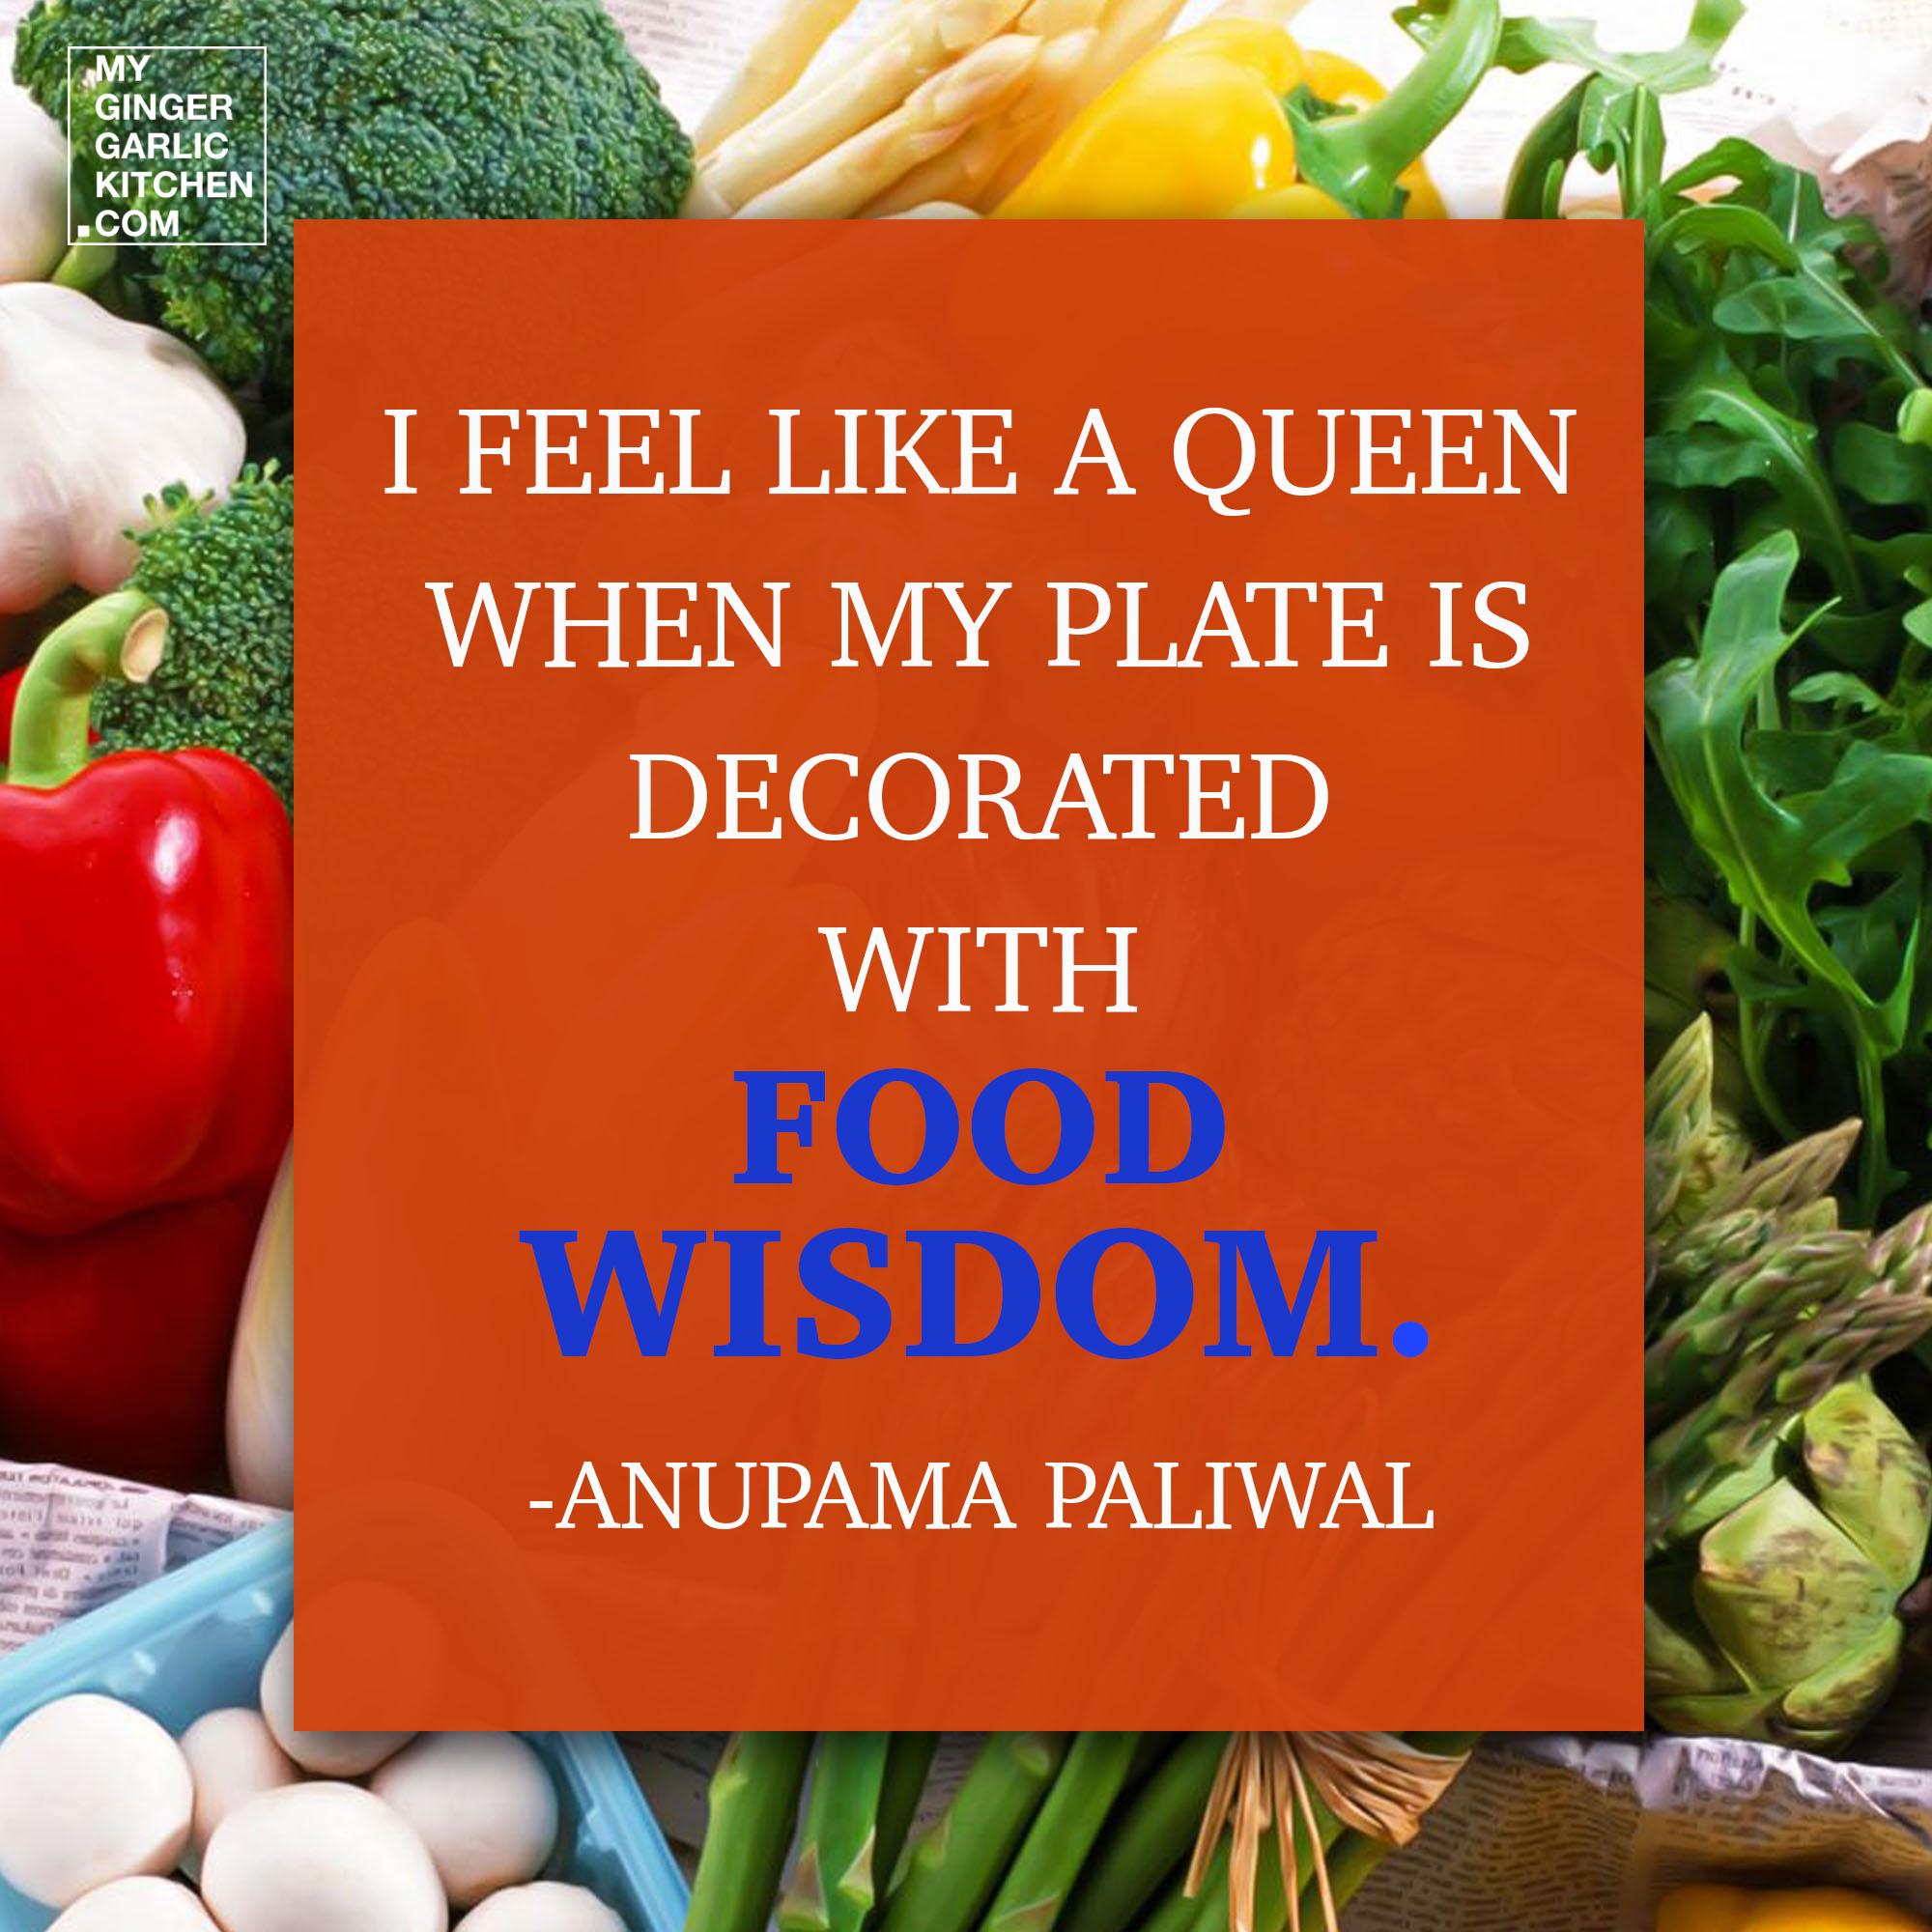 Image - quote wallpaper anupama paliwal my ginger garlic kitchen 7 1024x1024